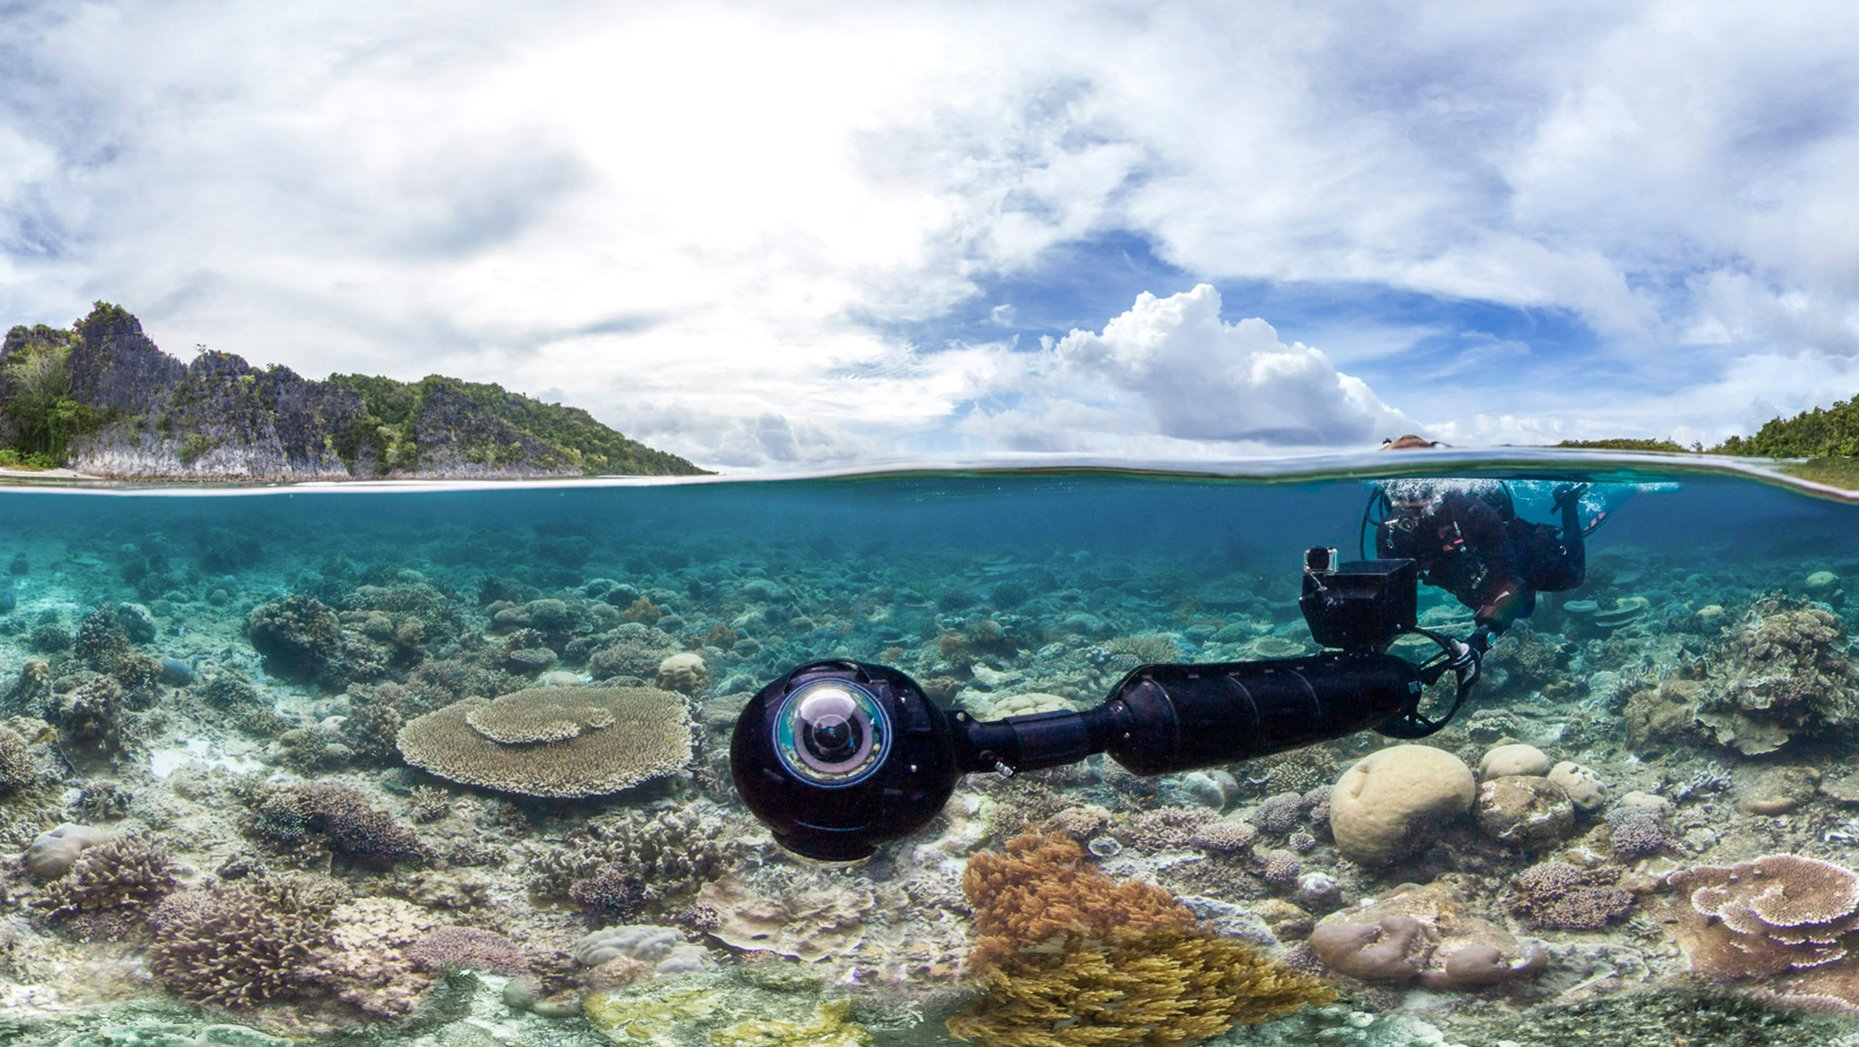 Google Keyword Chasing Coral Image 001.jpg